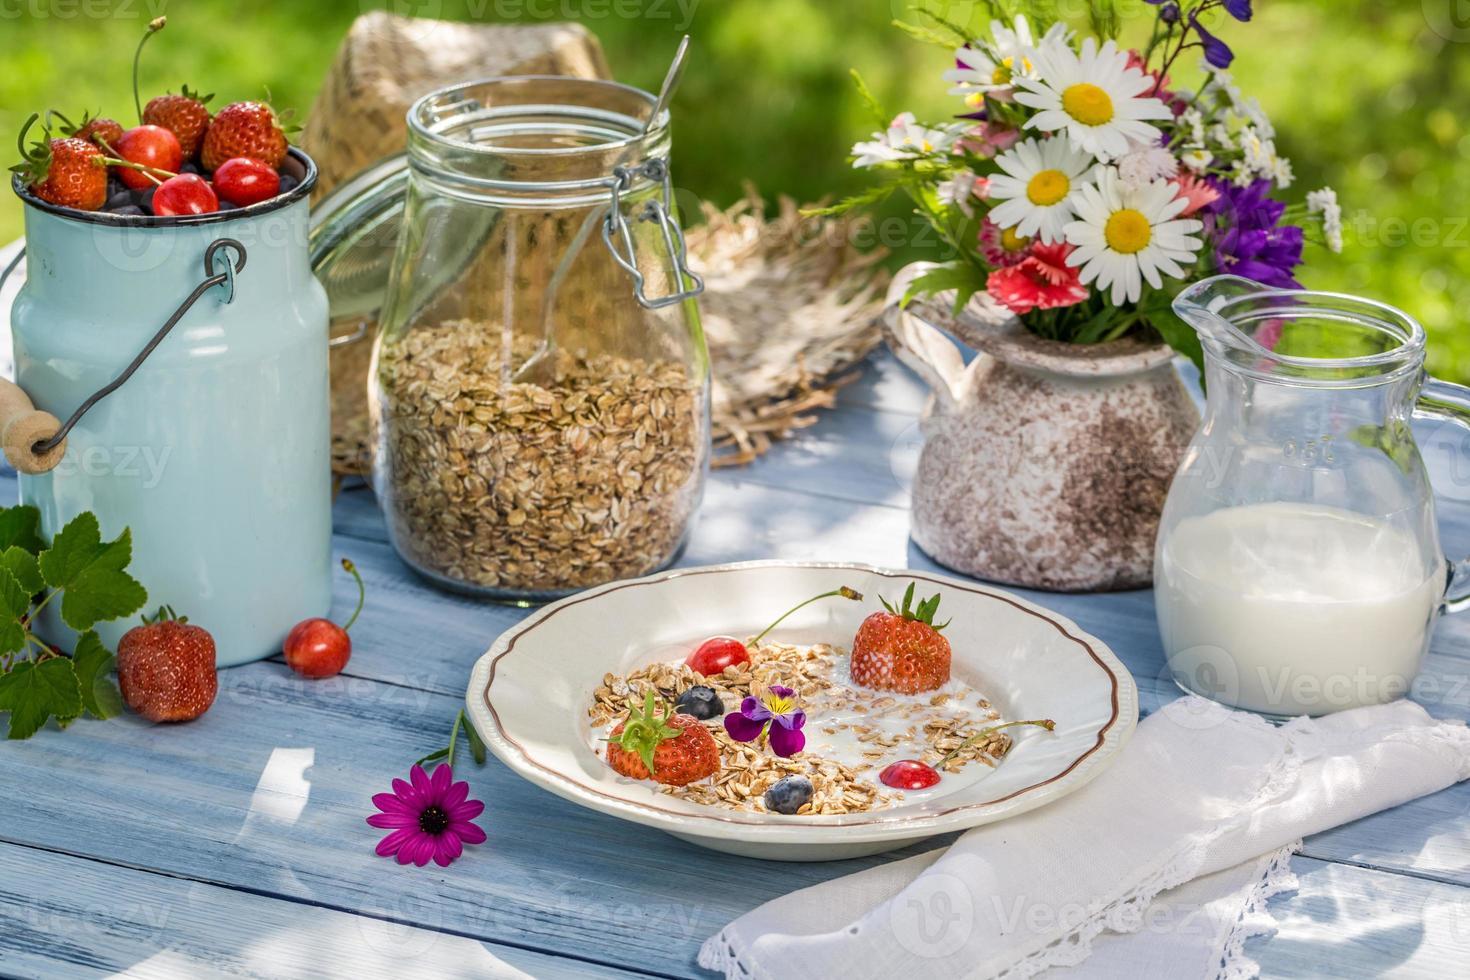 Summer breakfast in the garden photo